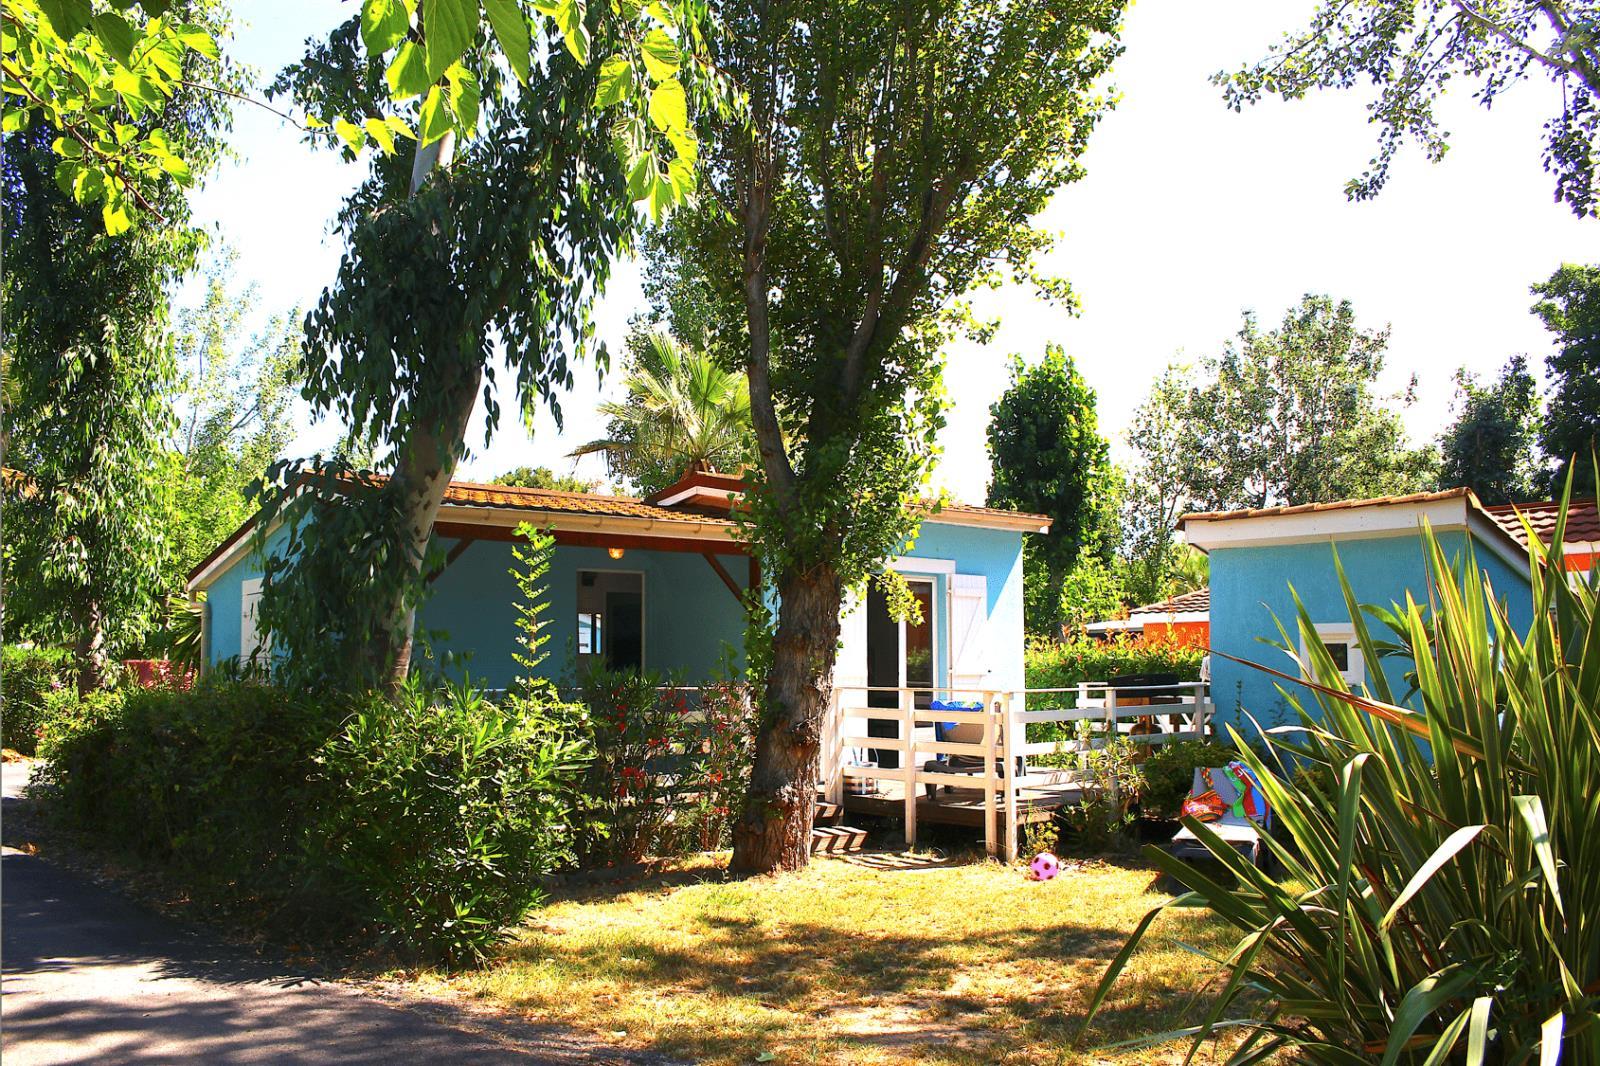 Location - Maya, Confort - Samedi - 2 Chambres - Camping L'Air Marin